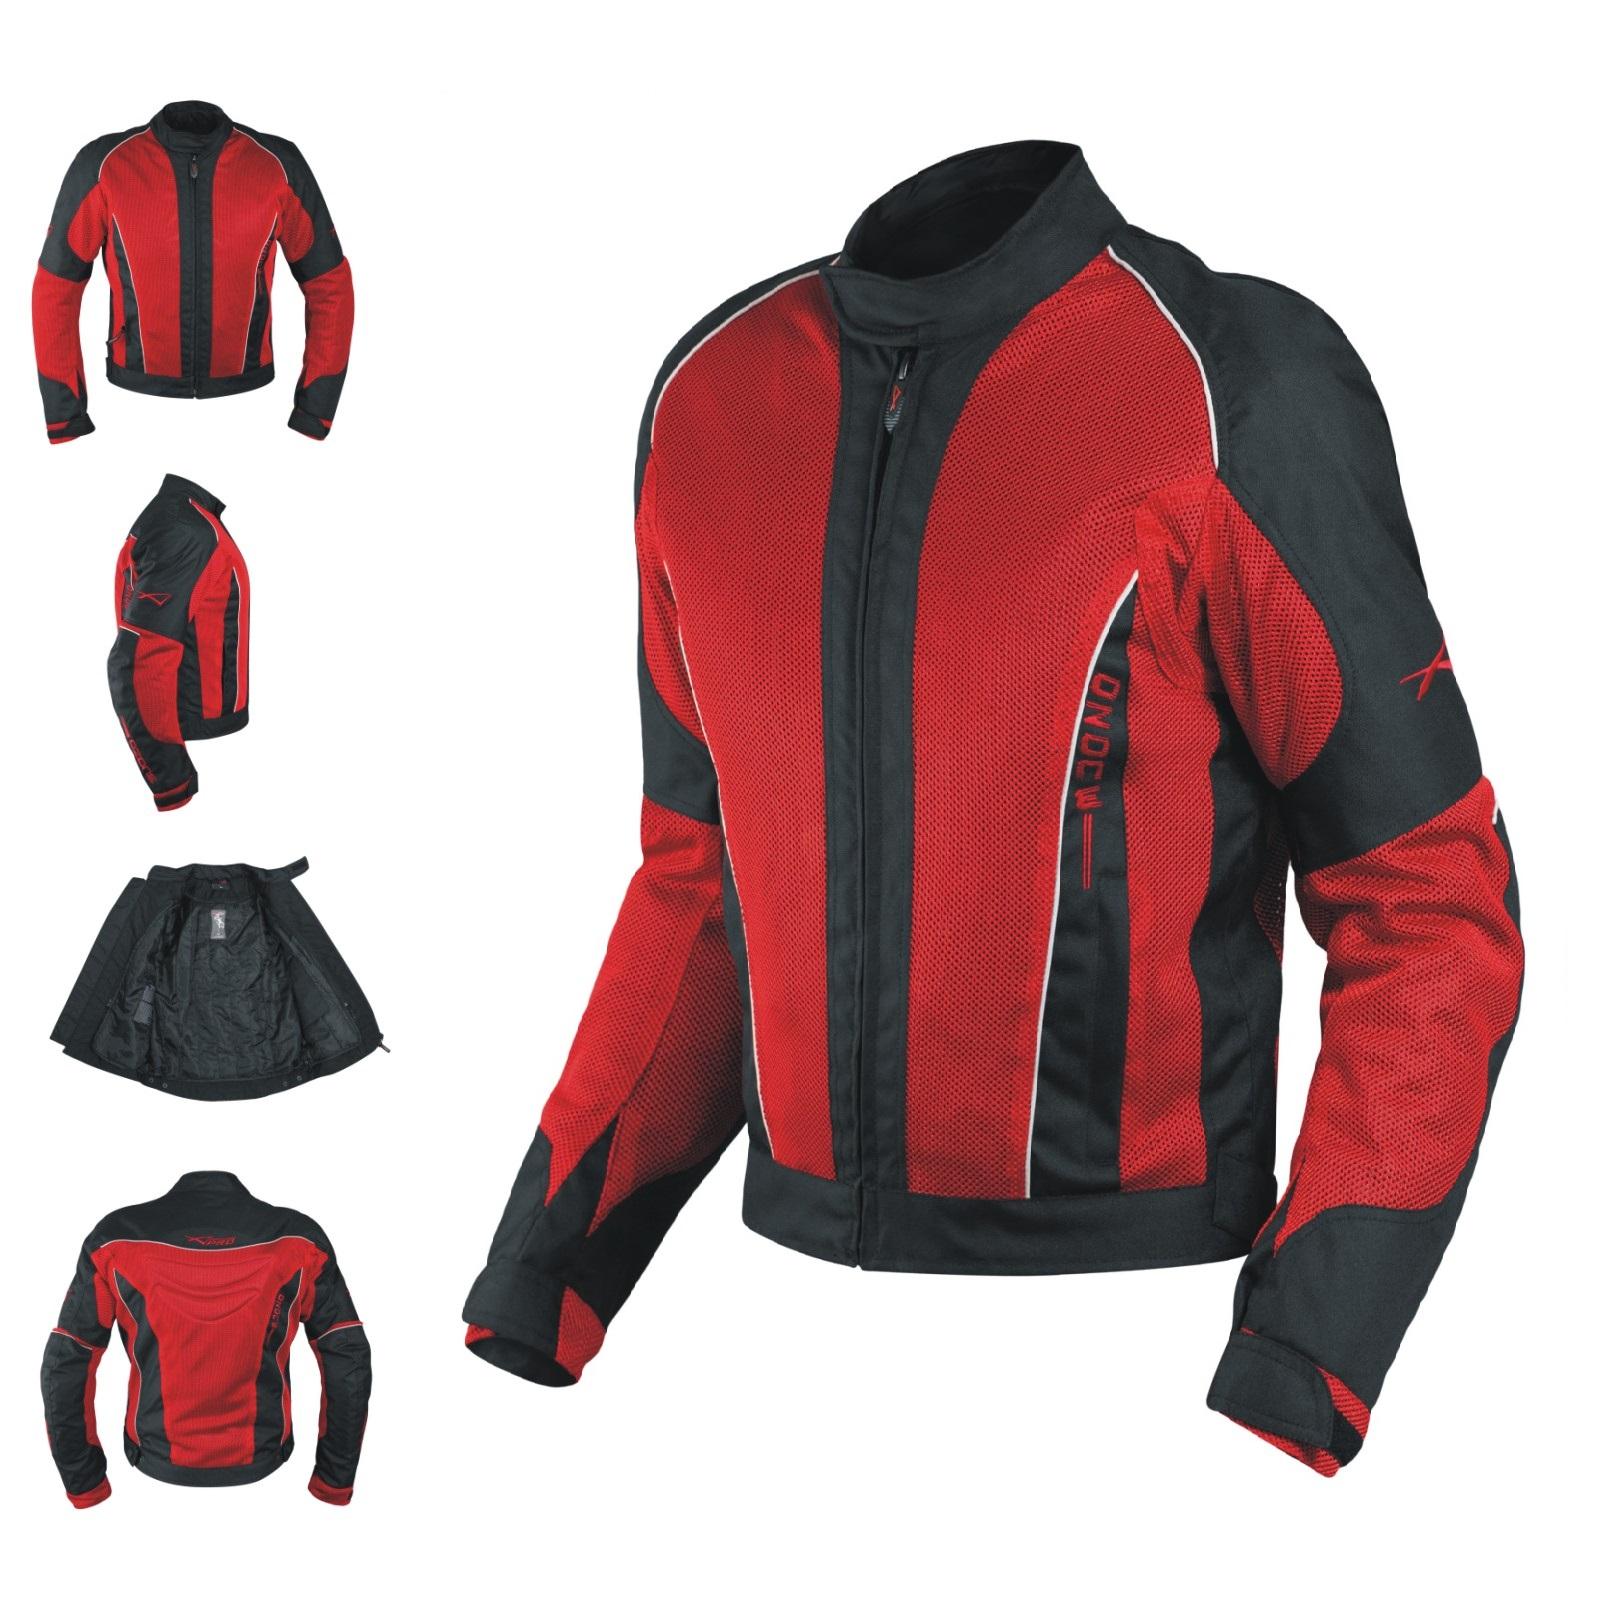 blouson textile et femme scooter moto mesh tex protections ce renfort dorsal ebay. Black Bedroom Furniture Sets. Home Design Ideas